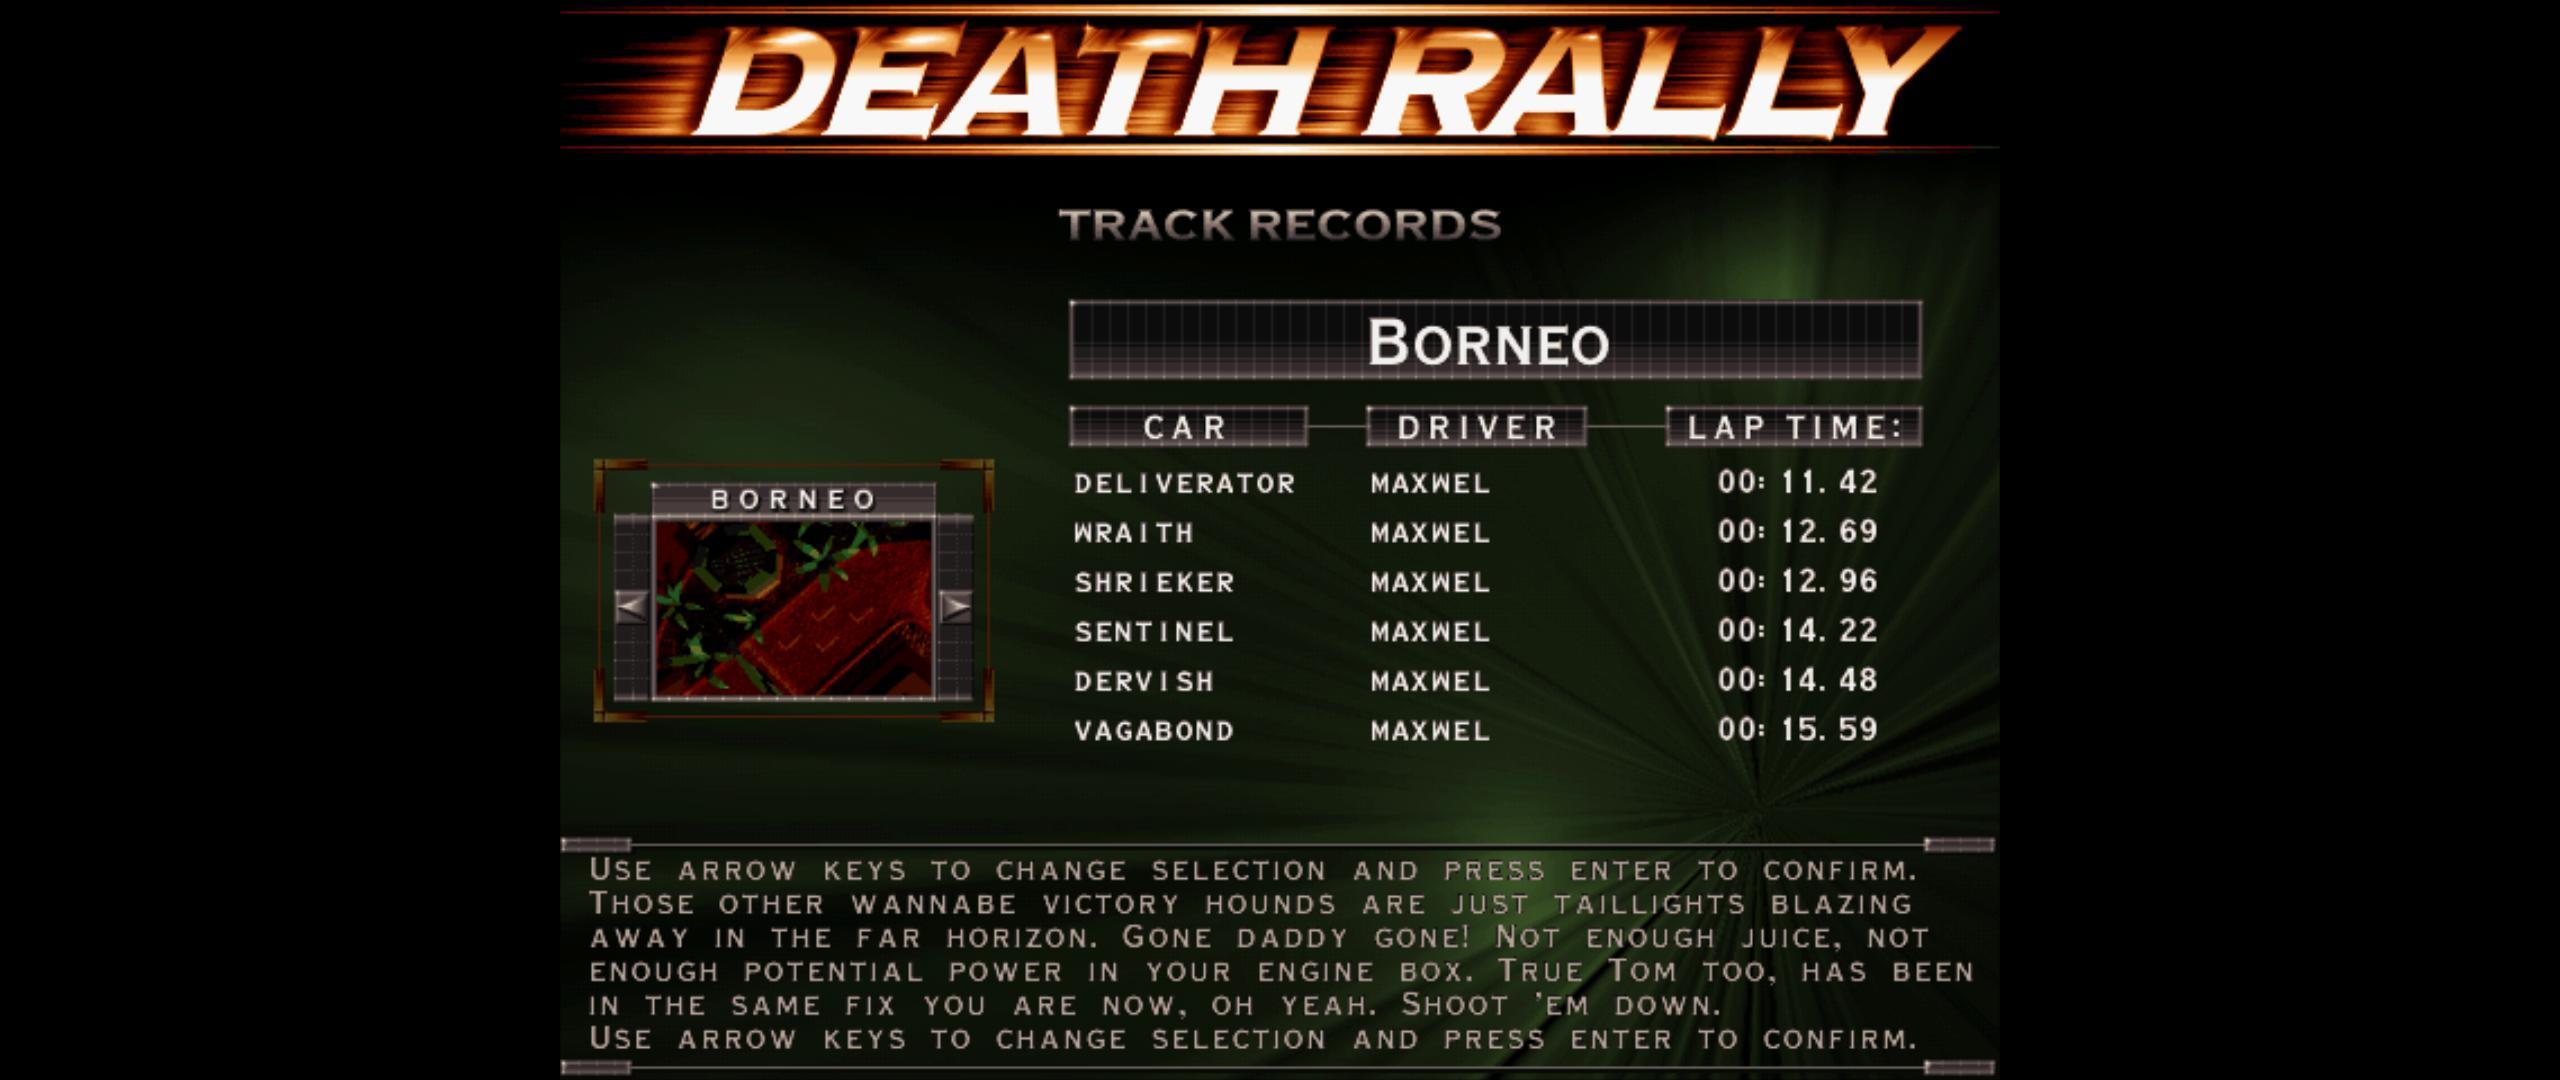 Maxwel: Death Rally [Borneo, Deliverator Car] (PC) 0:00:11.42 points on 2016-03-04 07:57:24